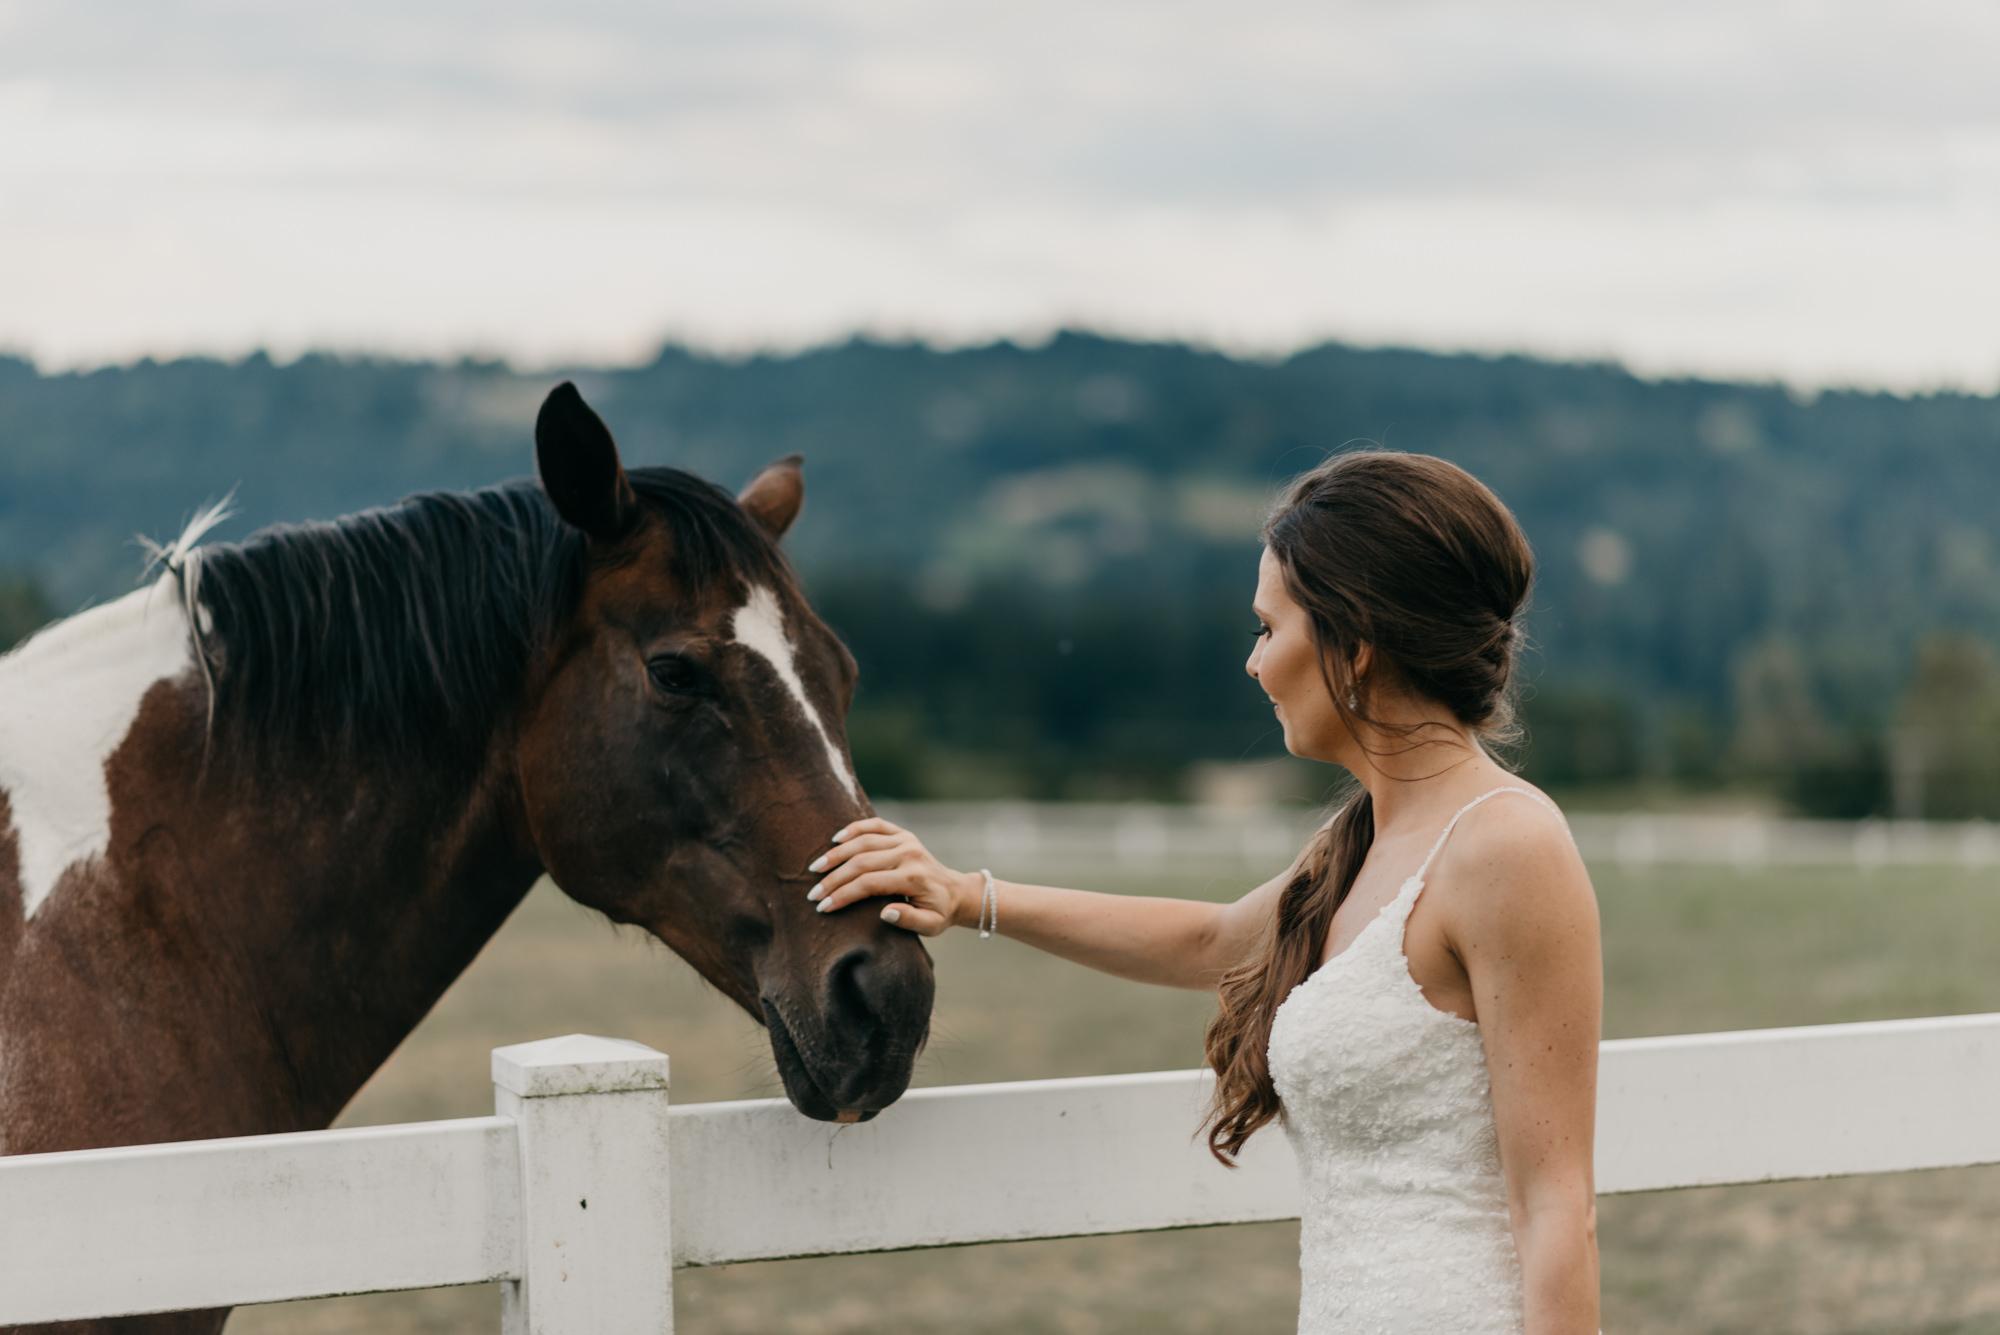 190-barn-kestrel-portland-northwest-horse-sunset-wedding.jpg